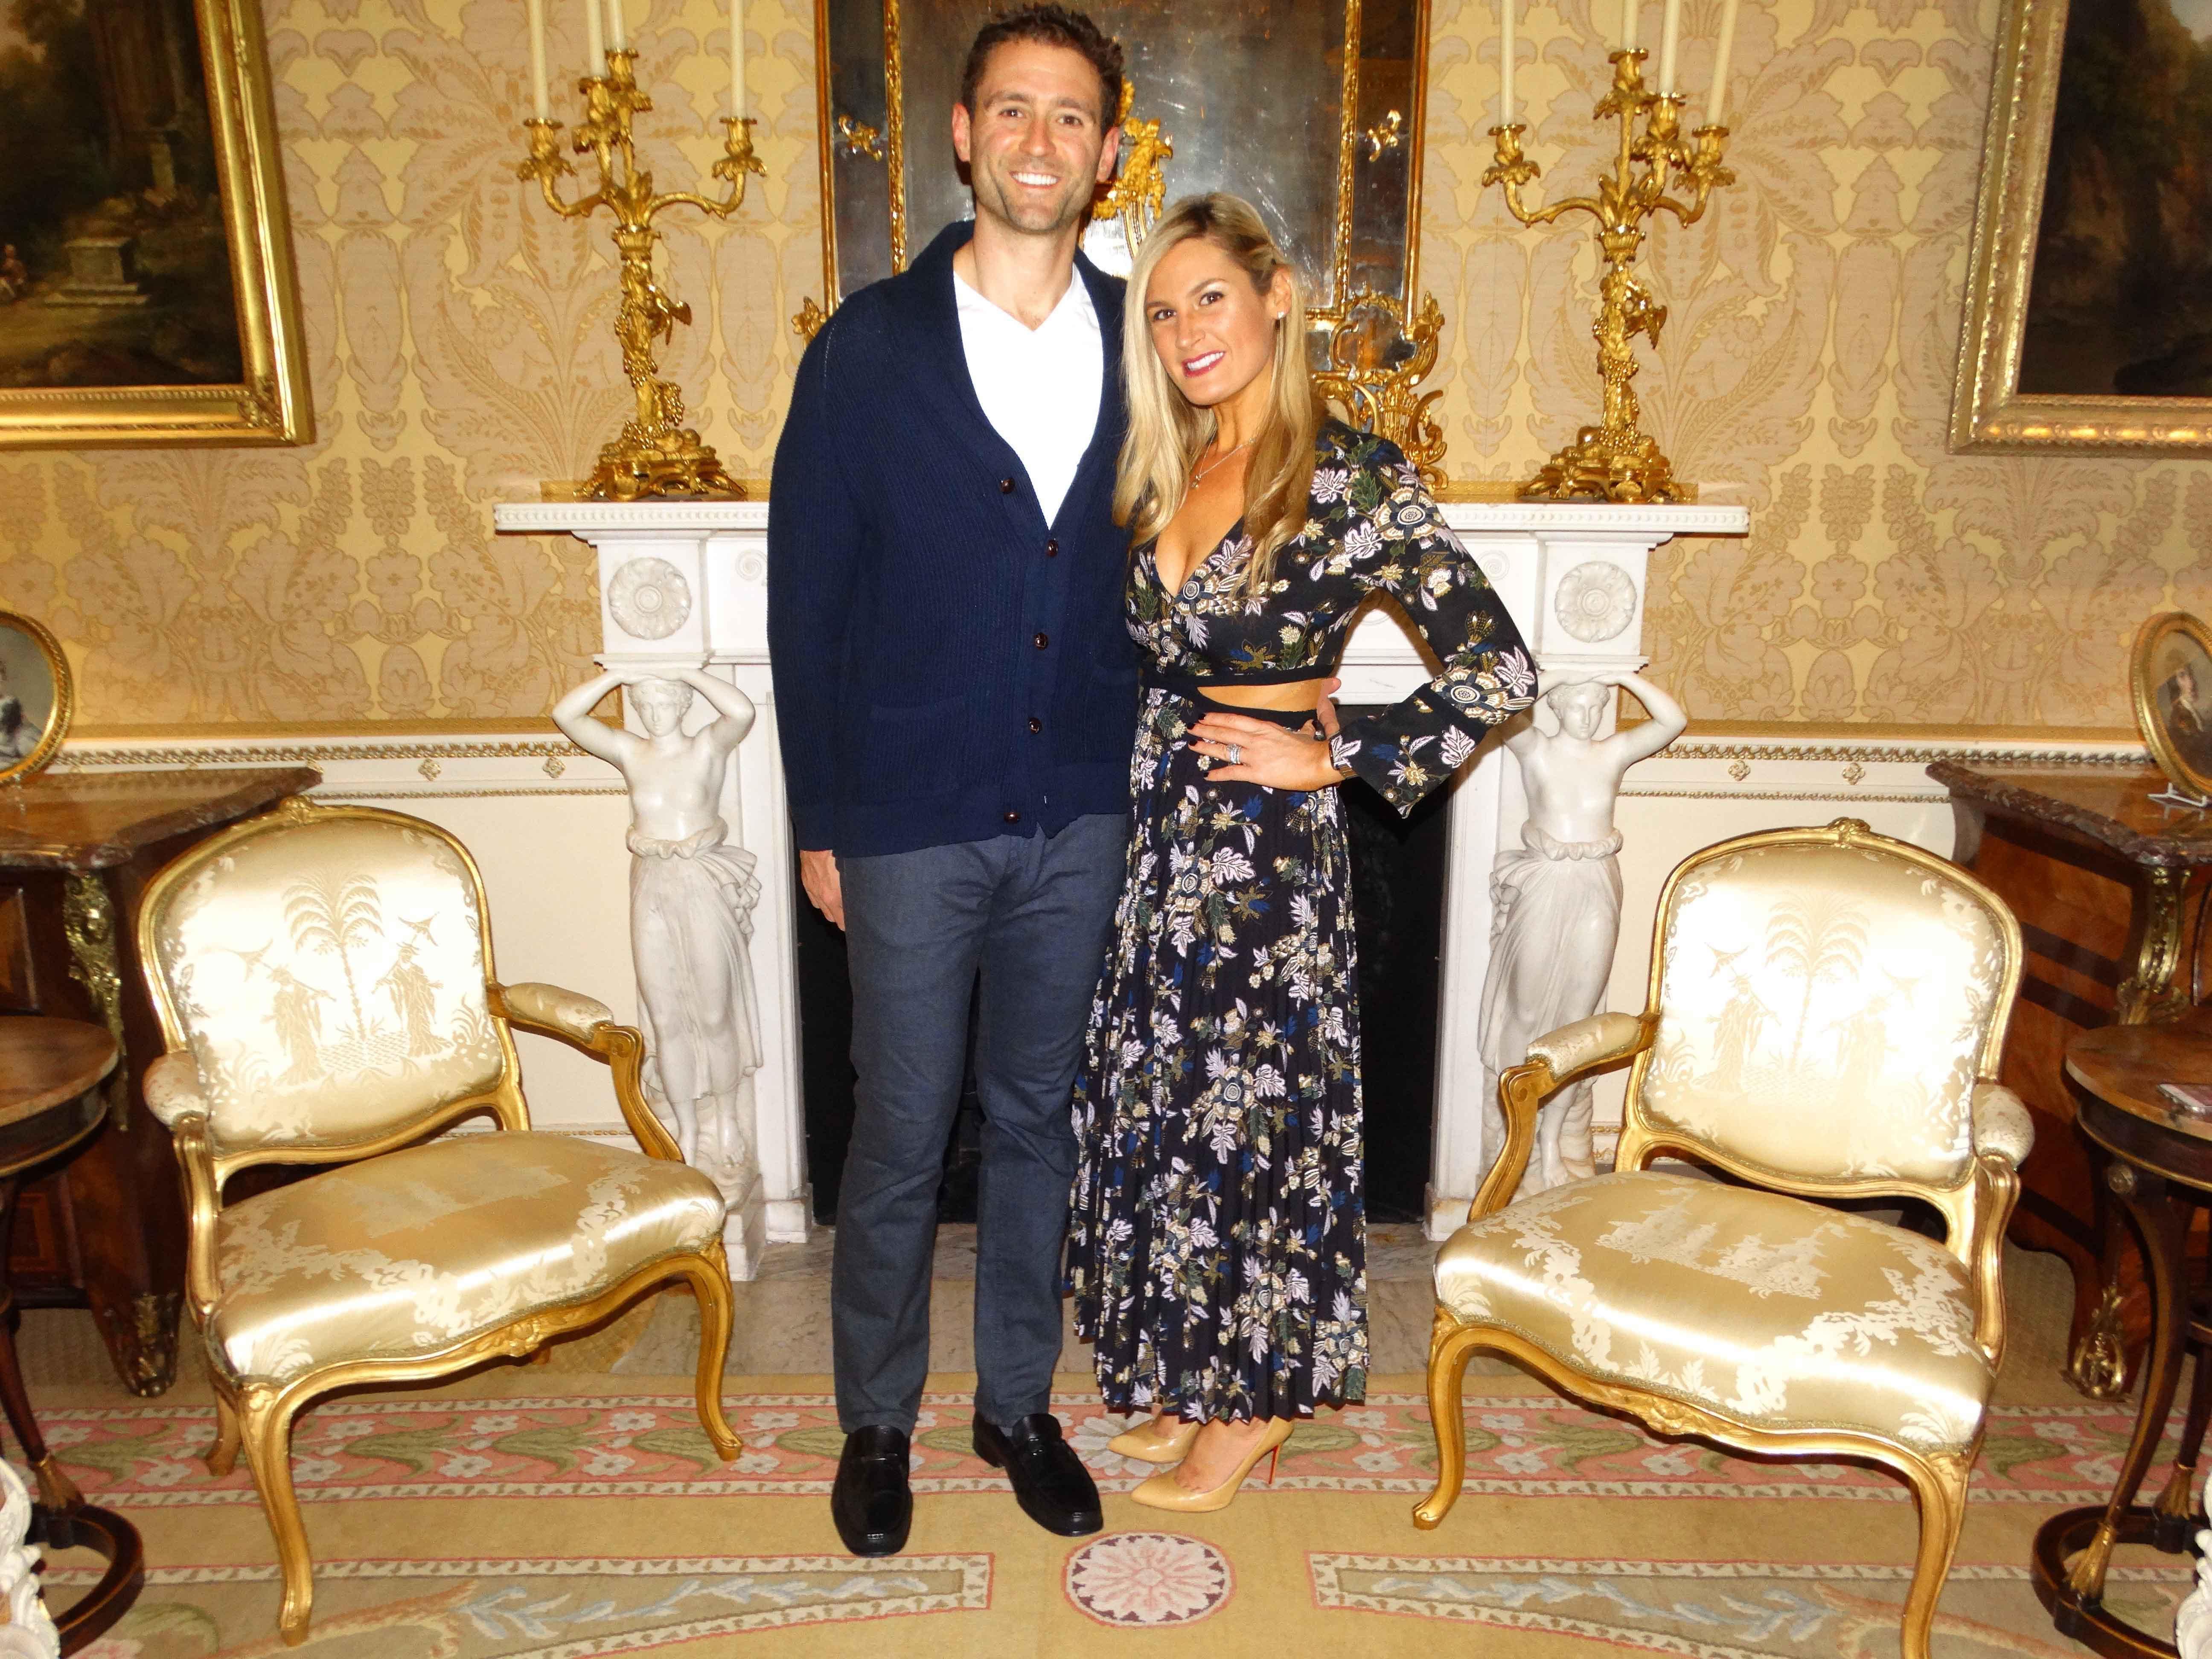 Newlywed couple at Ballyfin House in Ireland